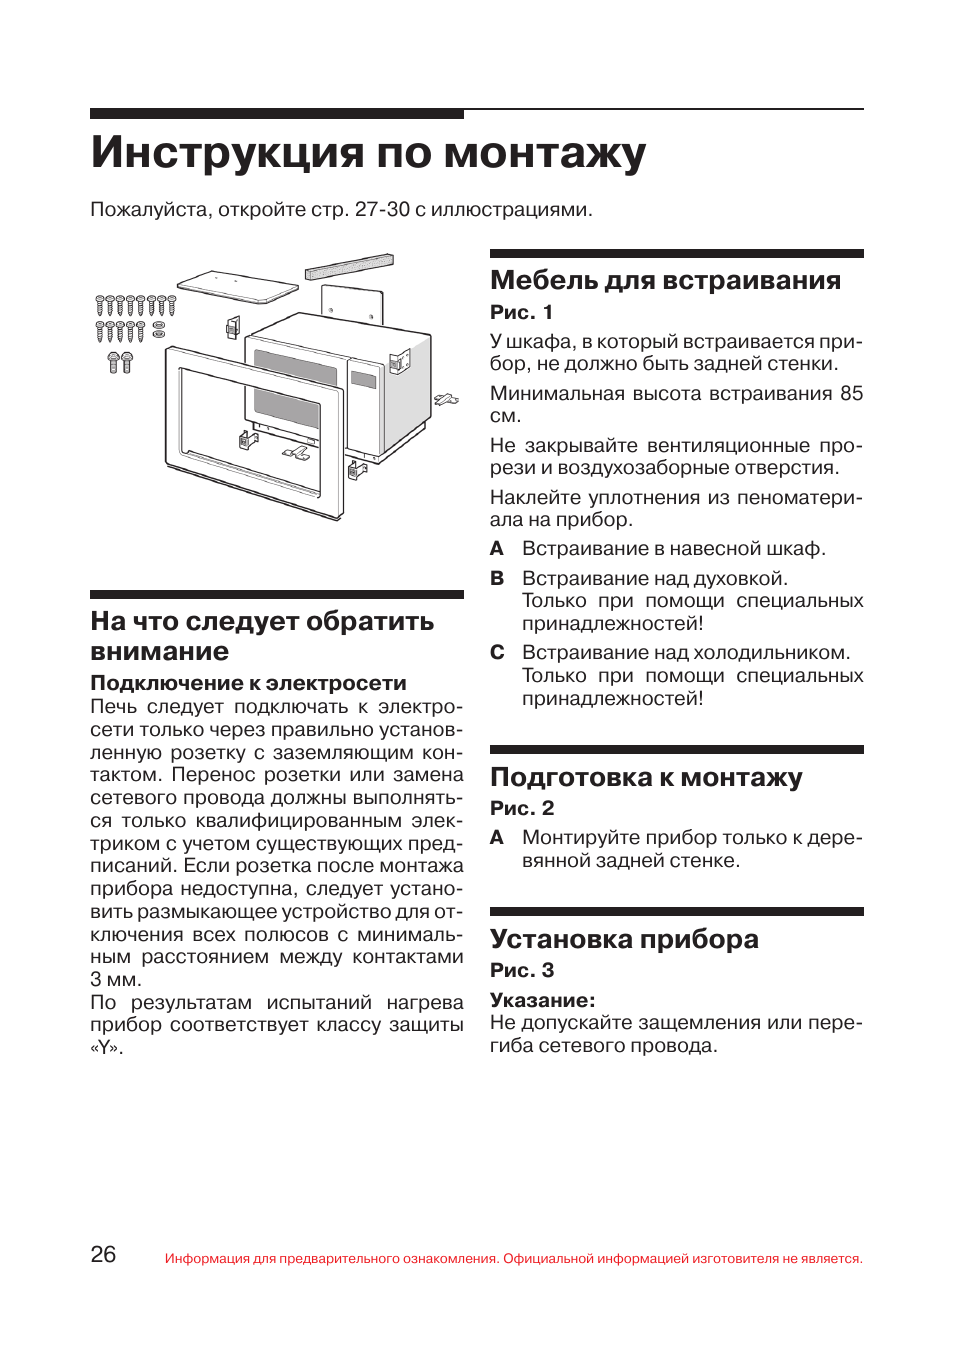 инструкция по монтажу vitotronic 100